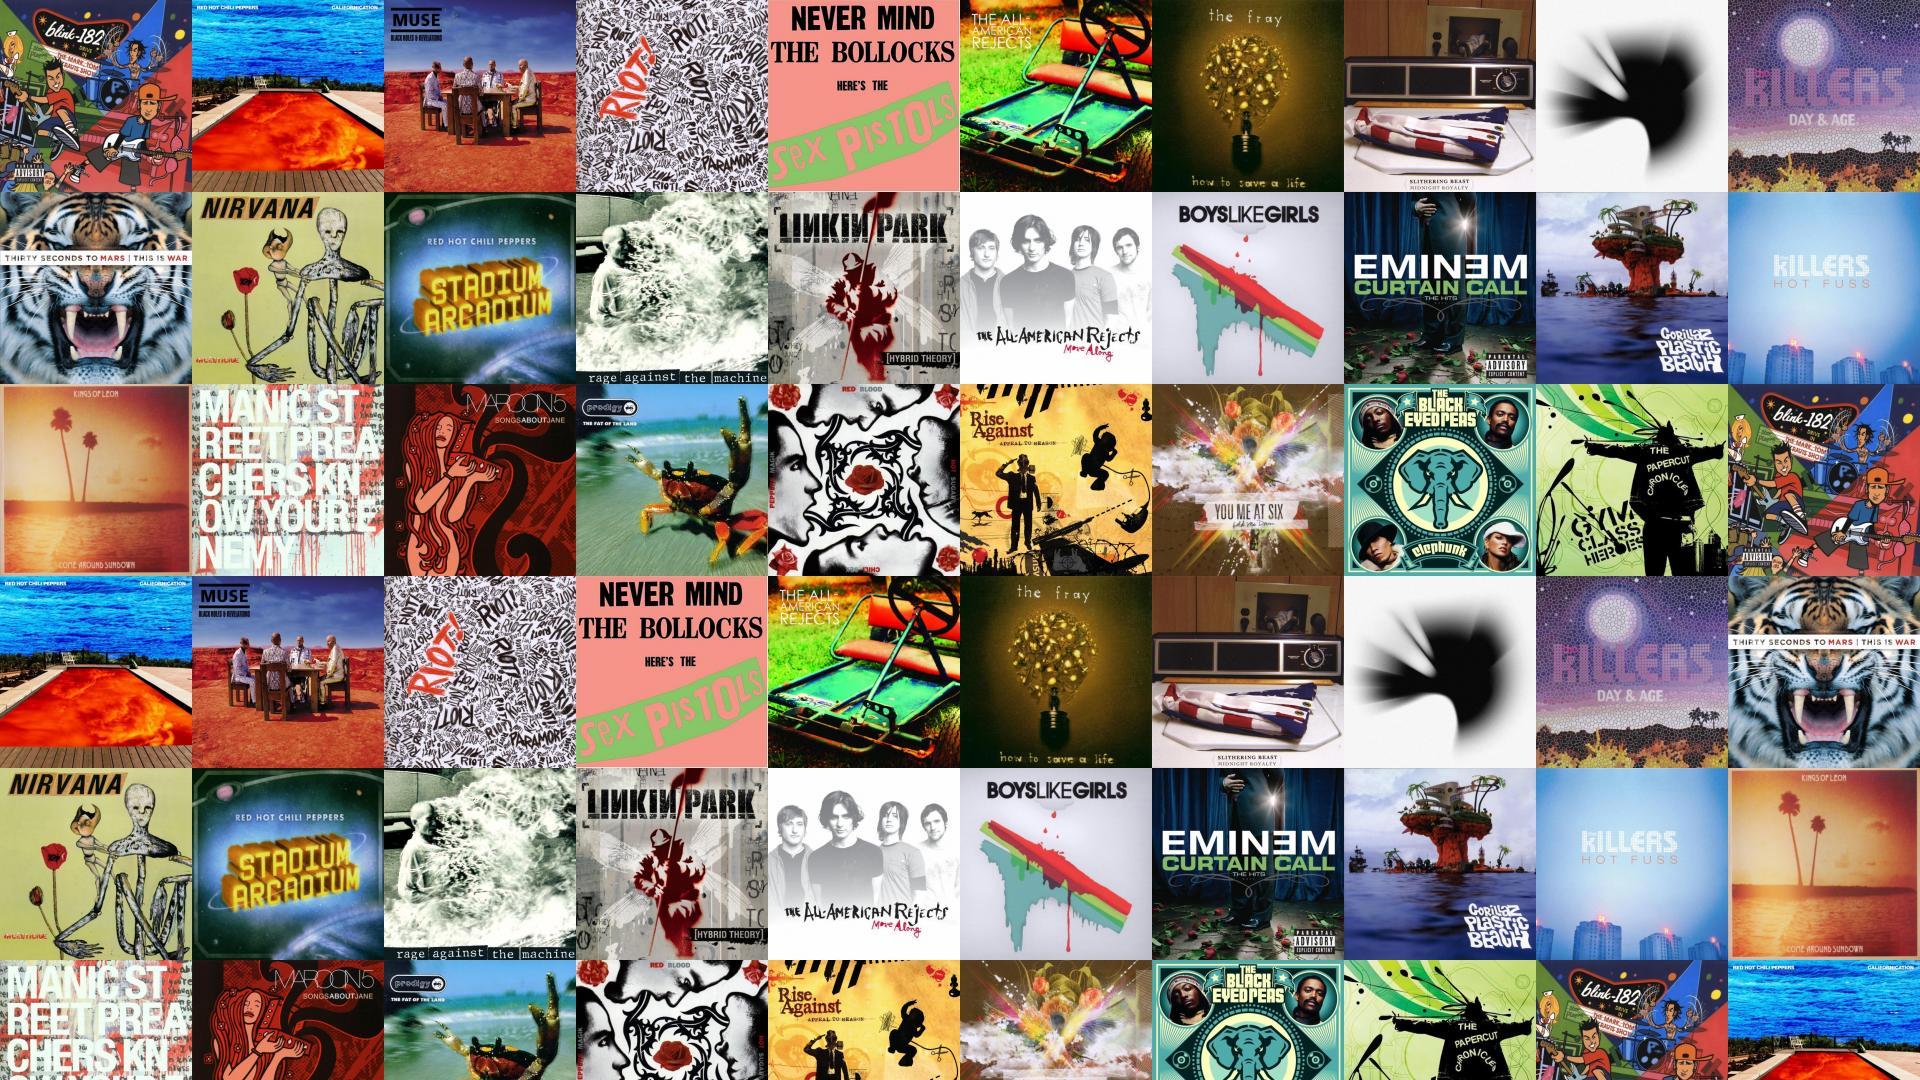 Blink 182 Rock Show Red Hot Chili Peppers Wallpaper « Tiled Desktop ...